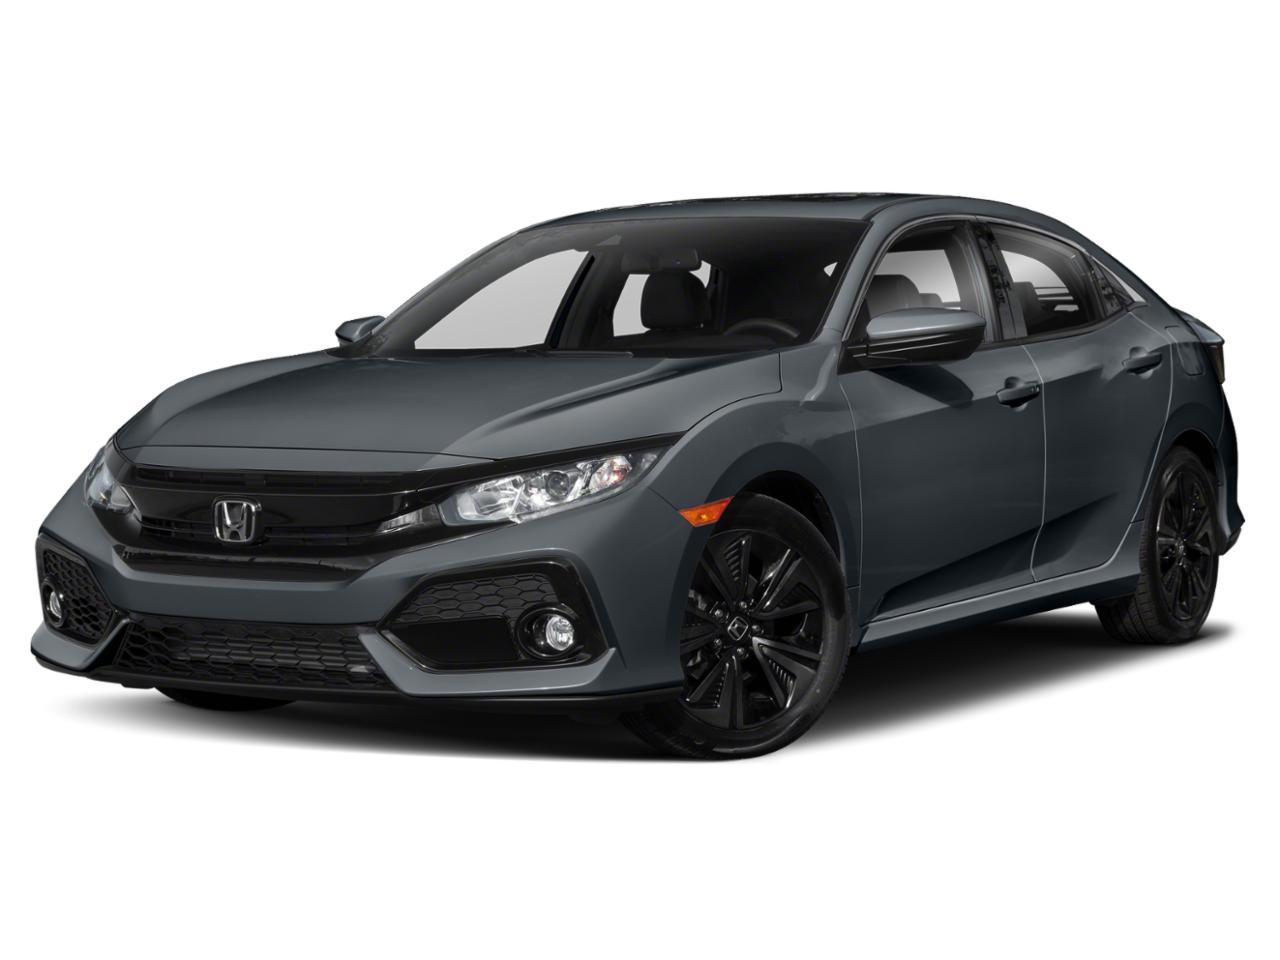 2019 Honda Civic Hatchback Vehicle Photo in Oklahoma City , OK 73131